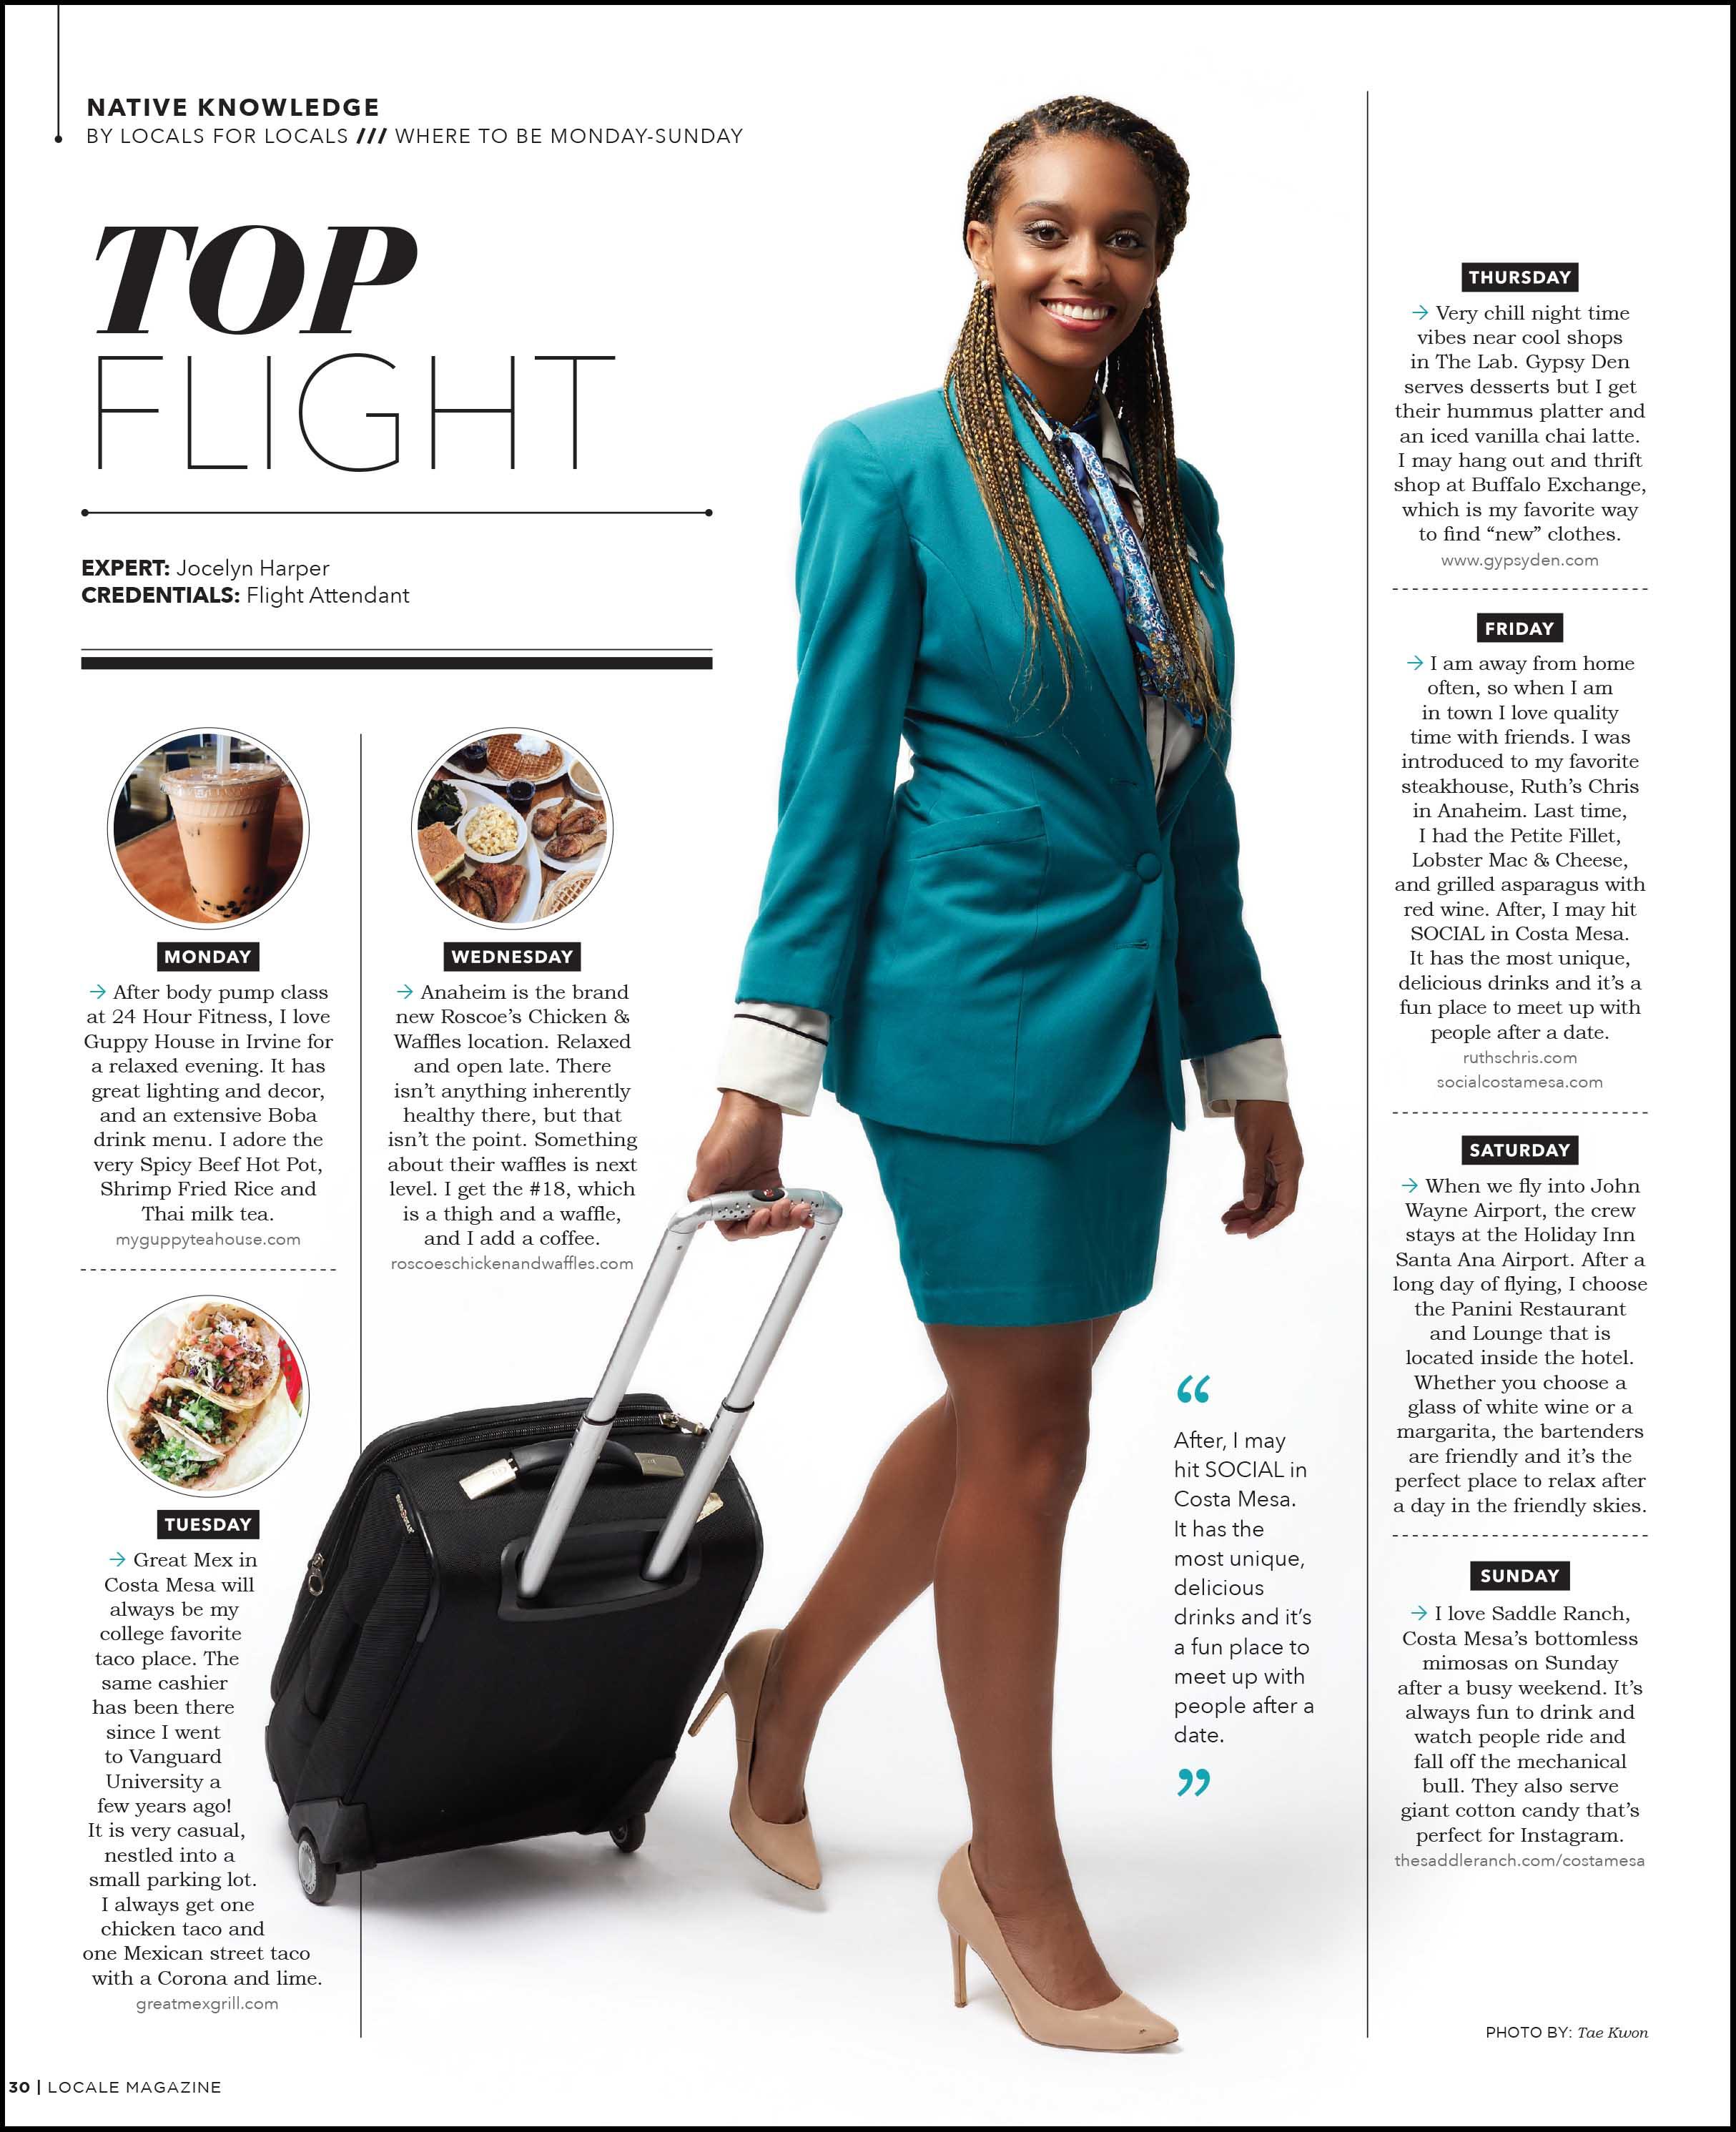 Jocelyn Harper: Flight Attendant